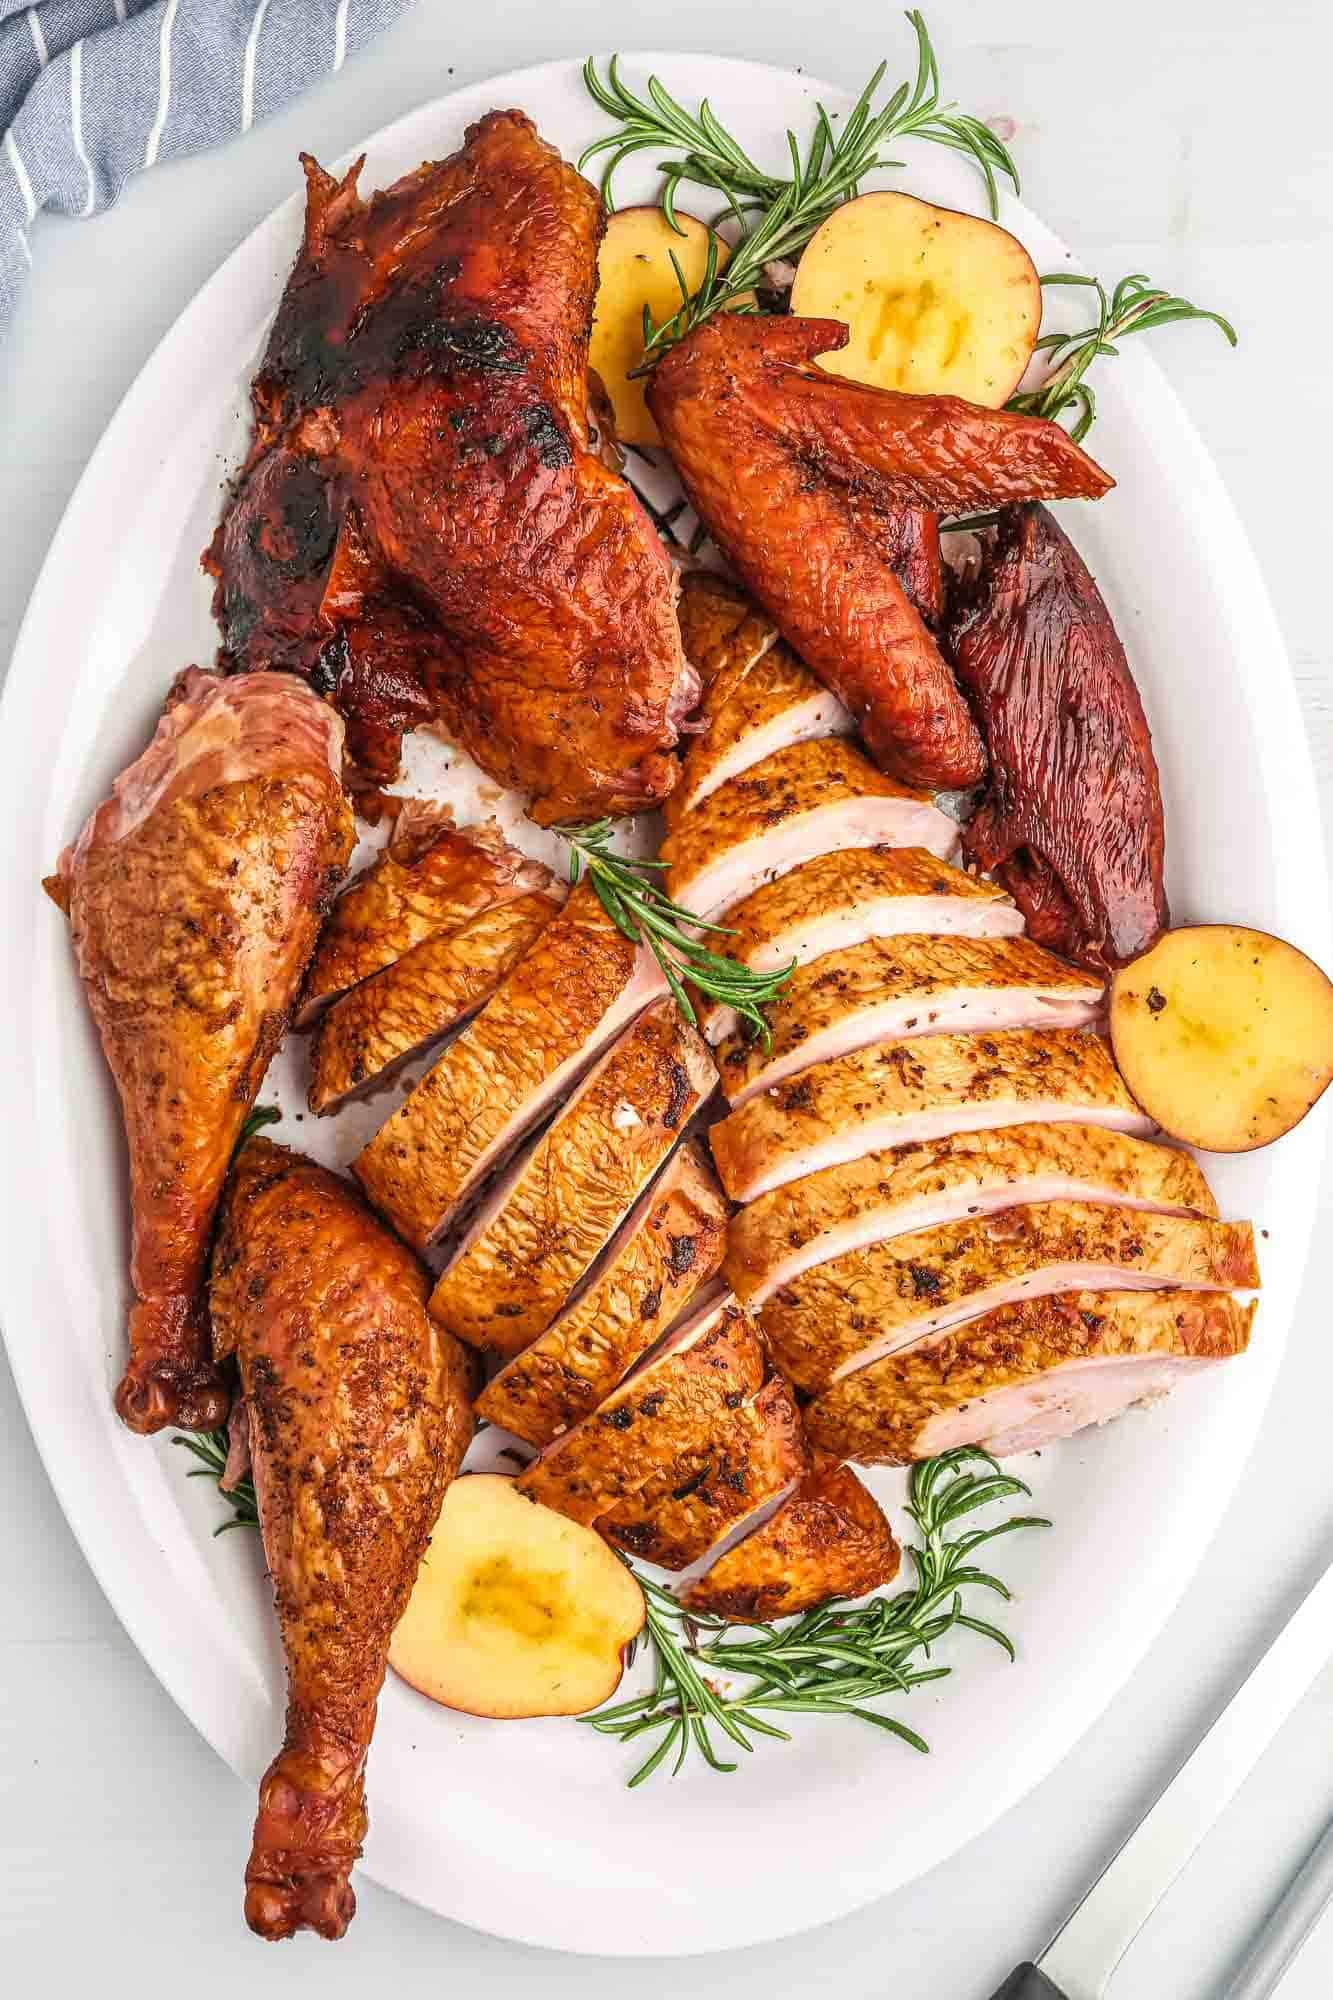 Carved turkey served on a white platter